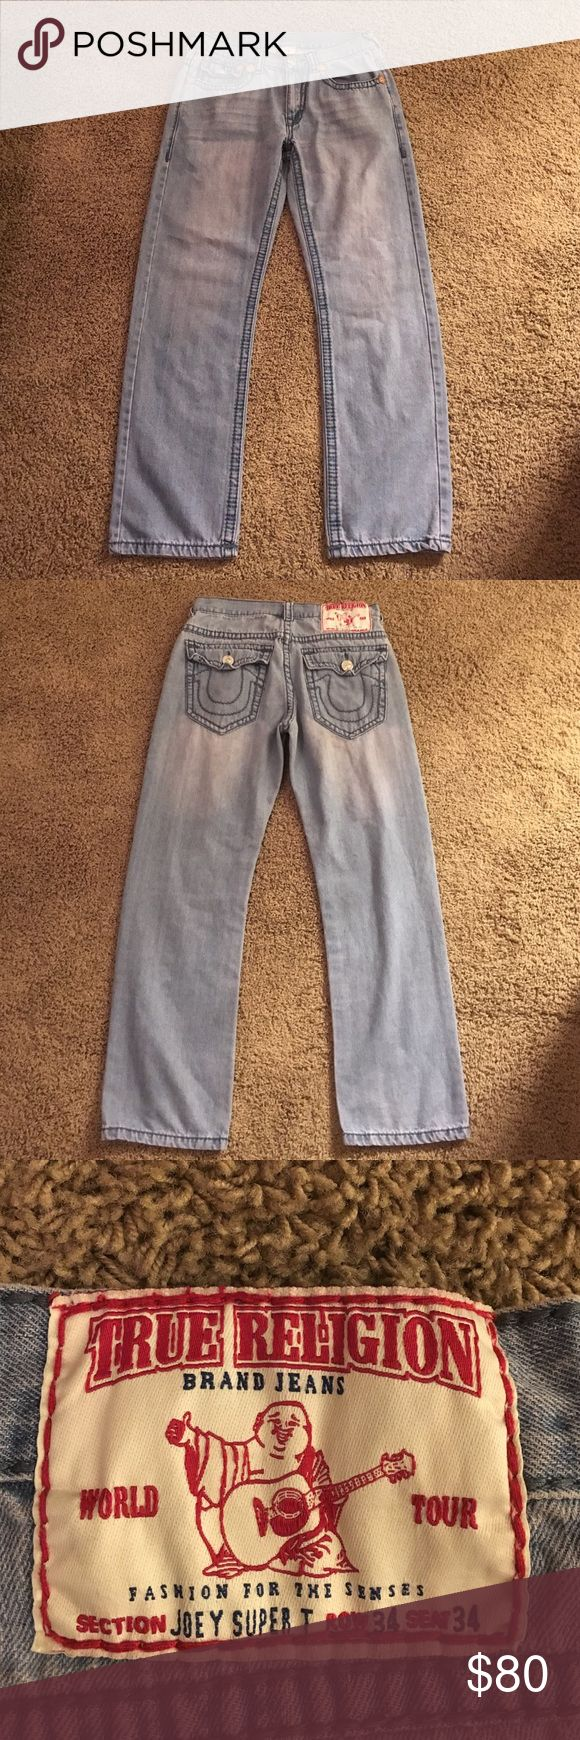 True Religion jeans Great pair of True Religion jeans True Religion Jeans Relaxed